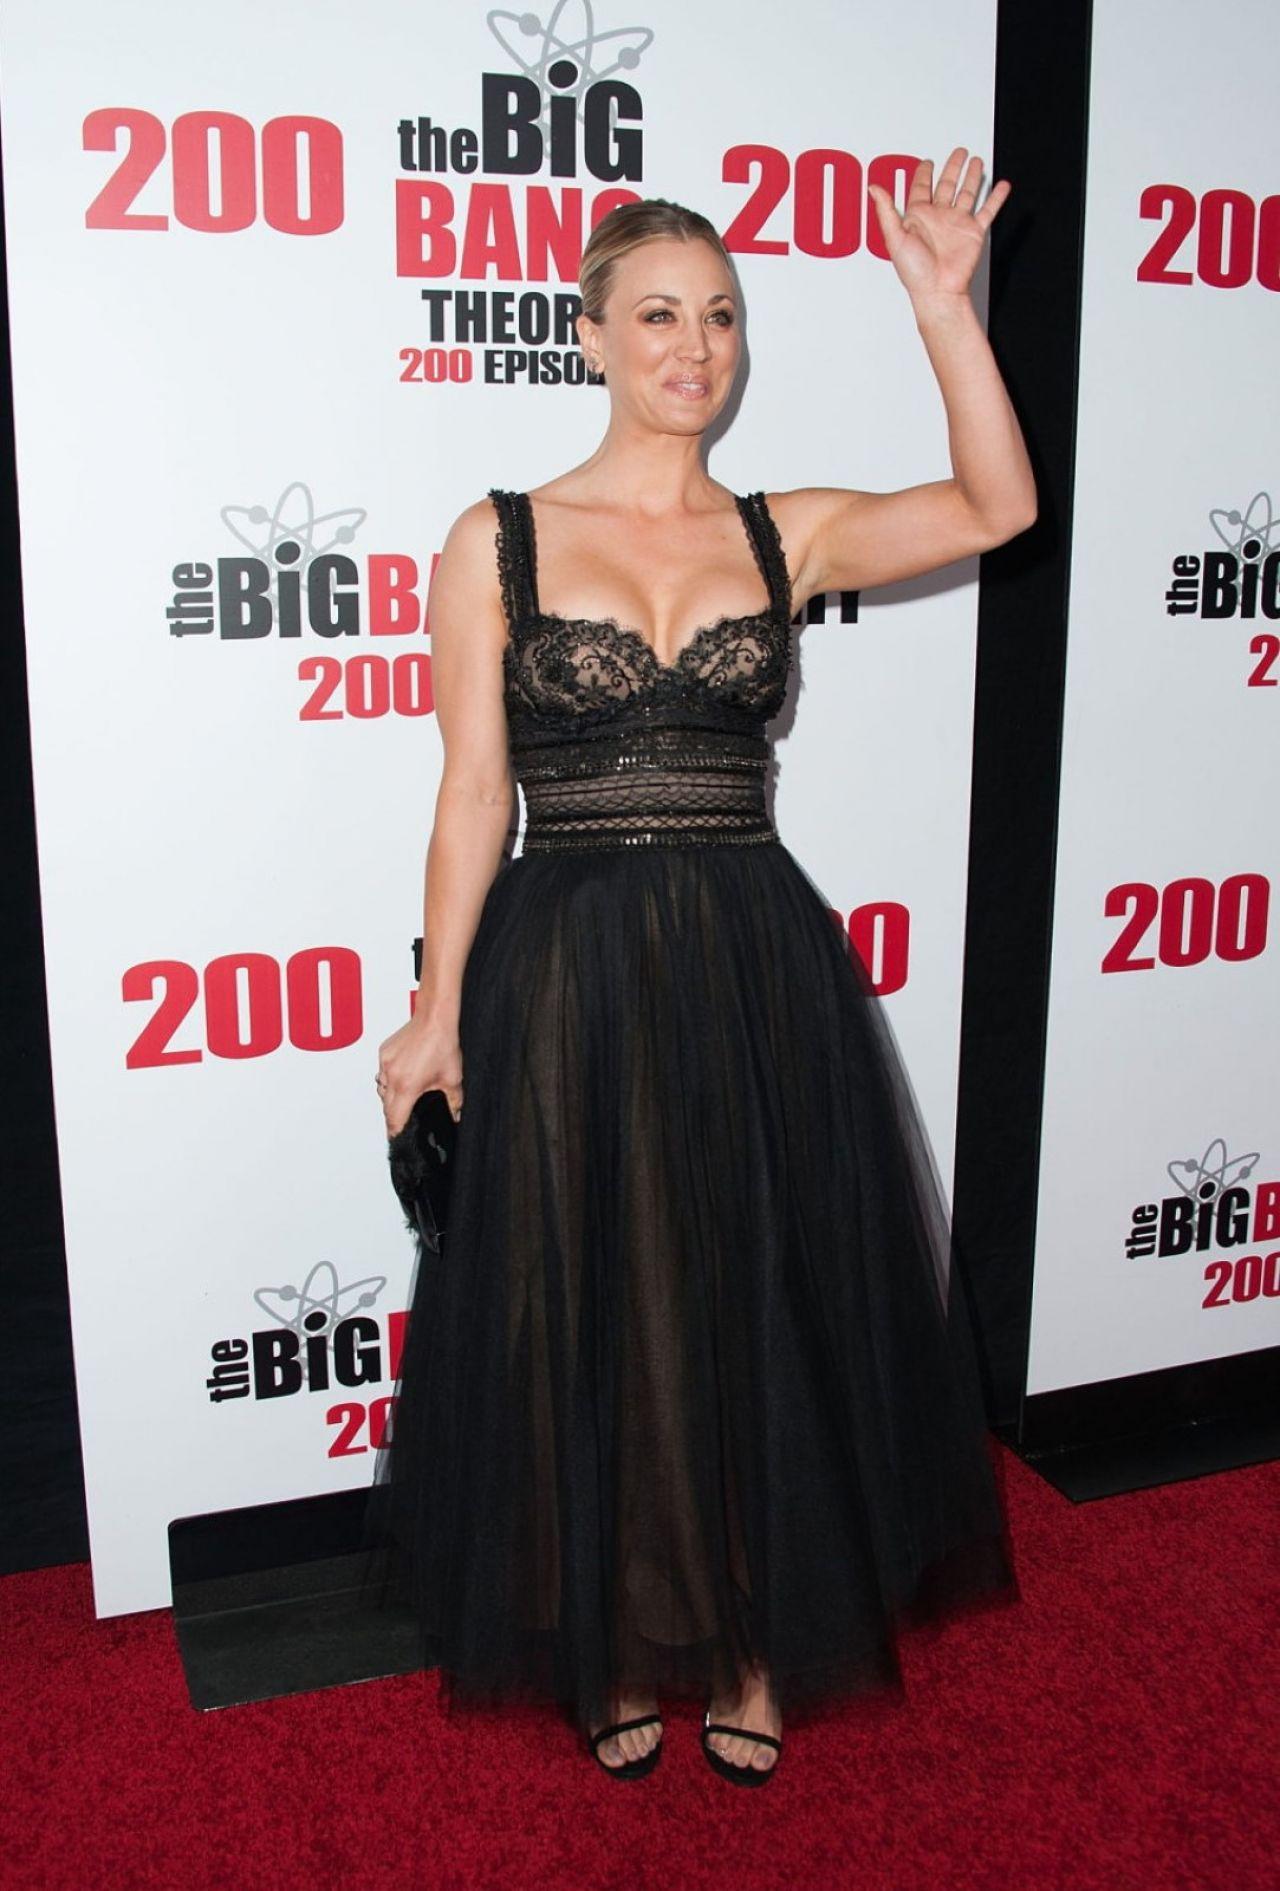 Kaley Cuoco Cbs S The Big Bang Theory Celebrates 200th